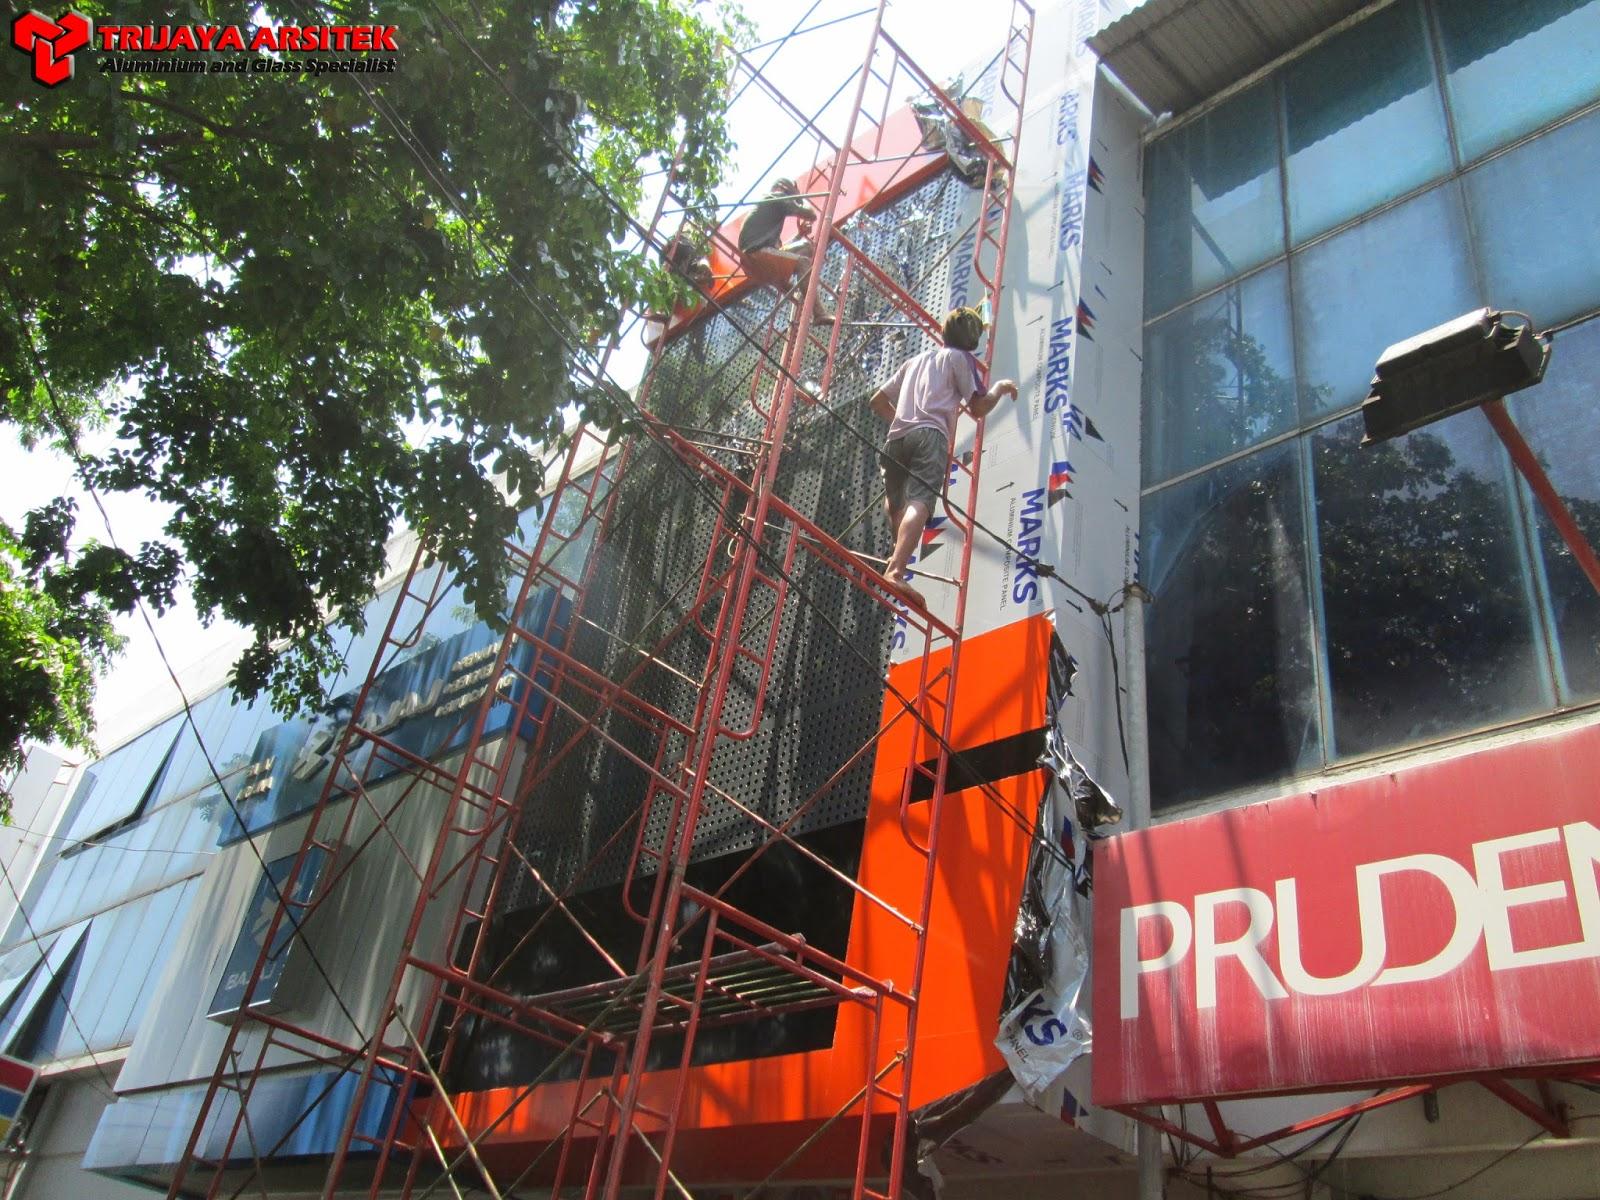 Aluminium Composite Panel, Facade, Letter, Letter Stainless, Neon Box, Proyek Surabaya